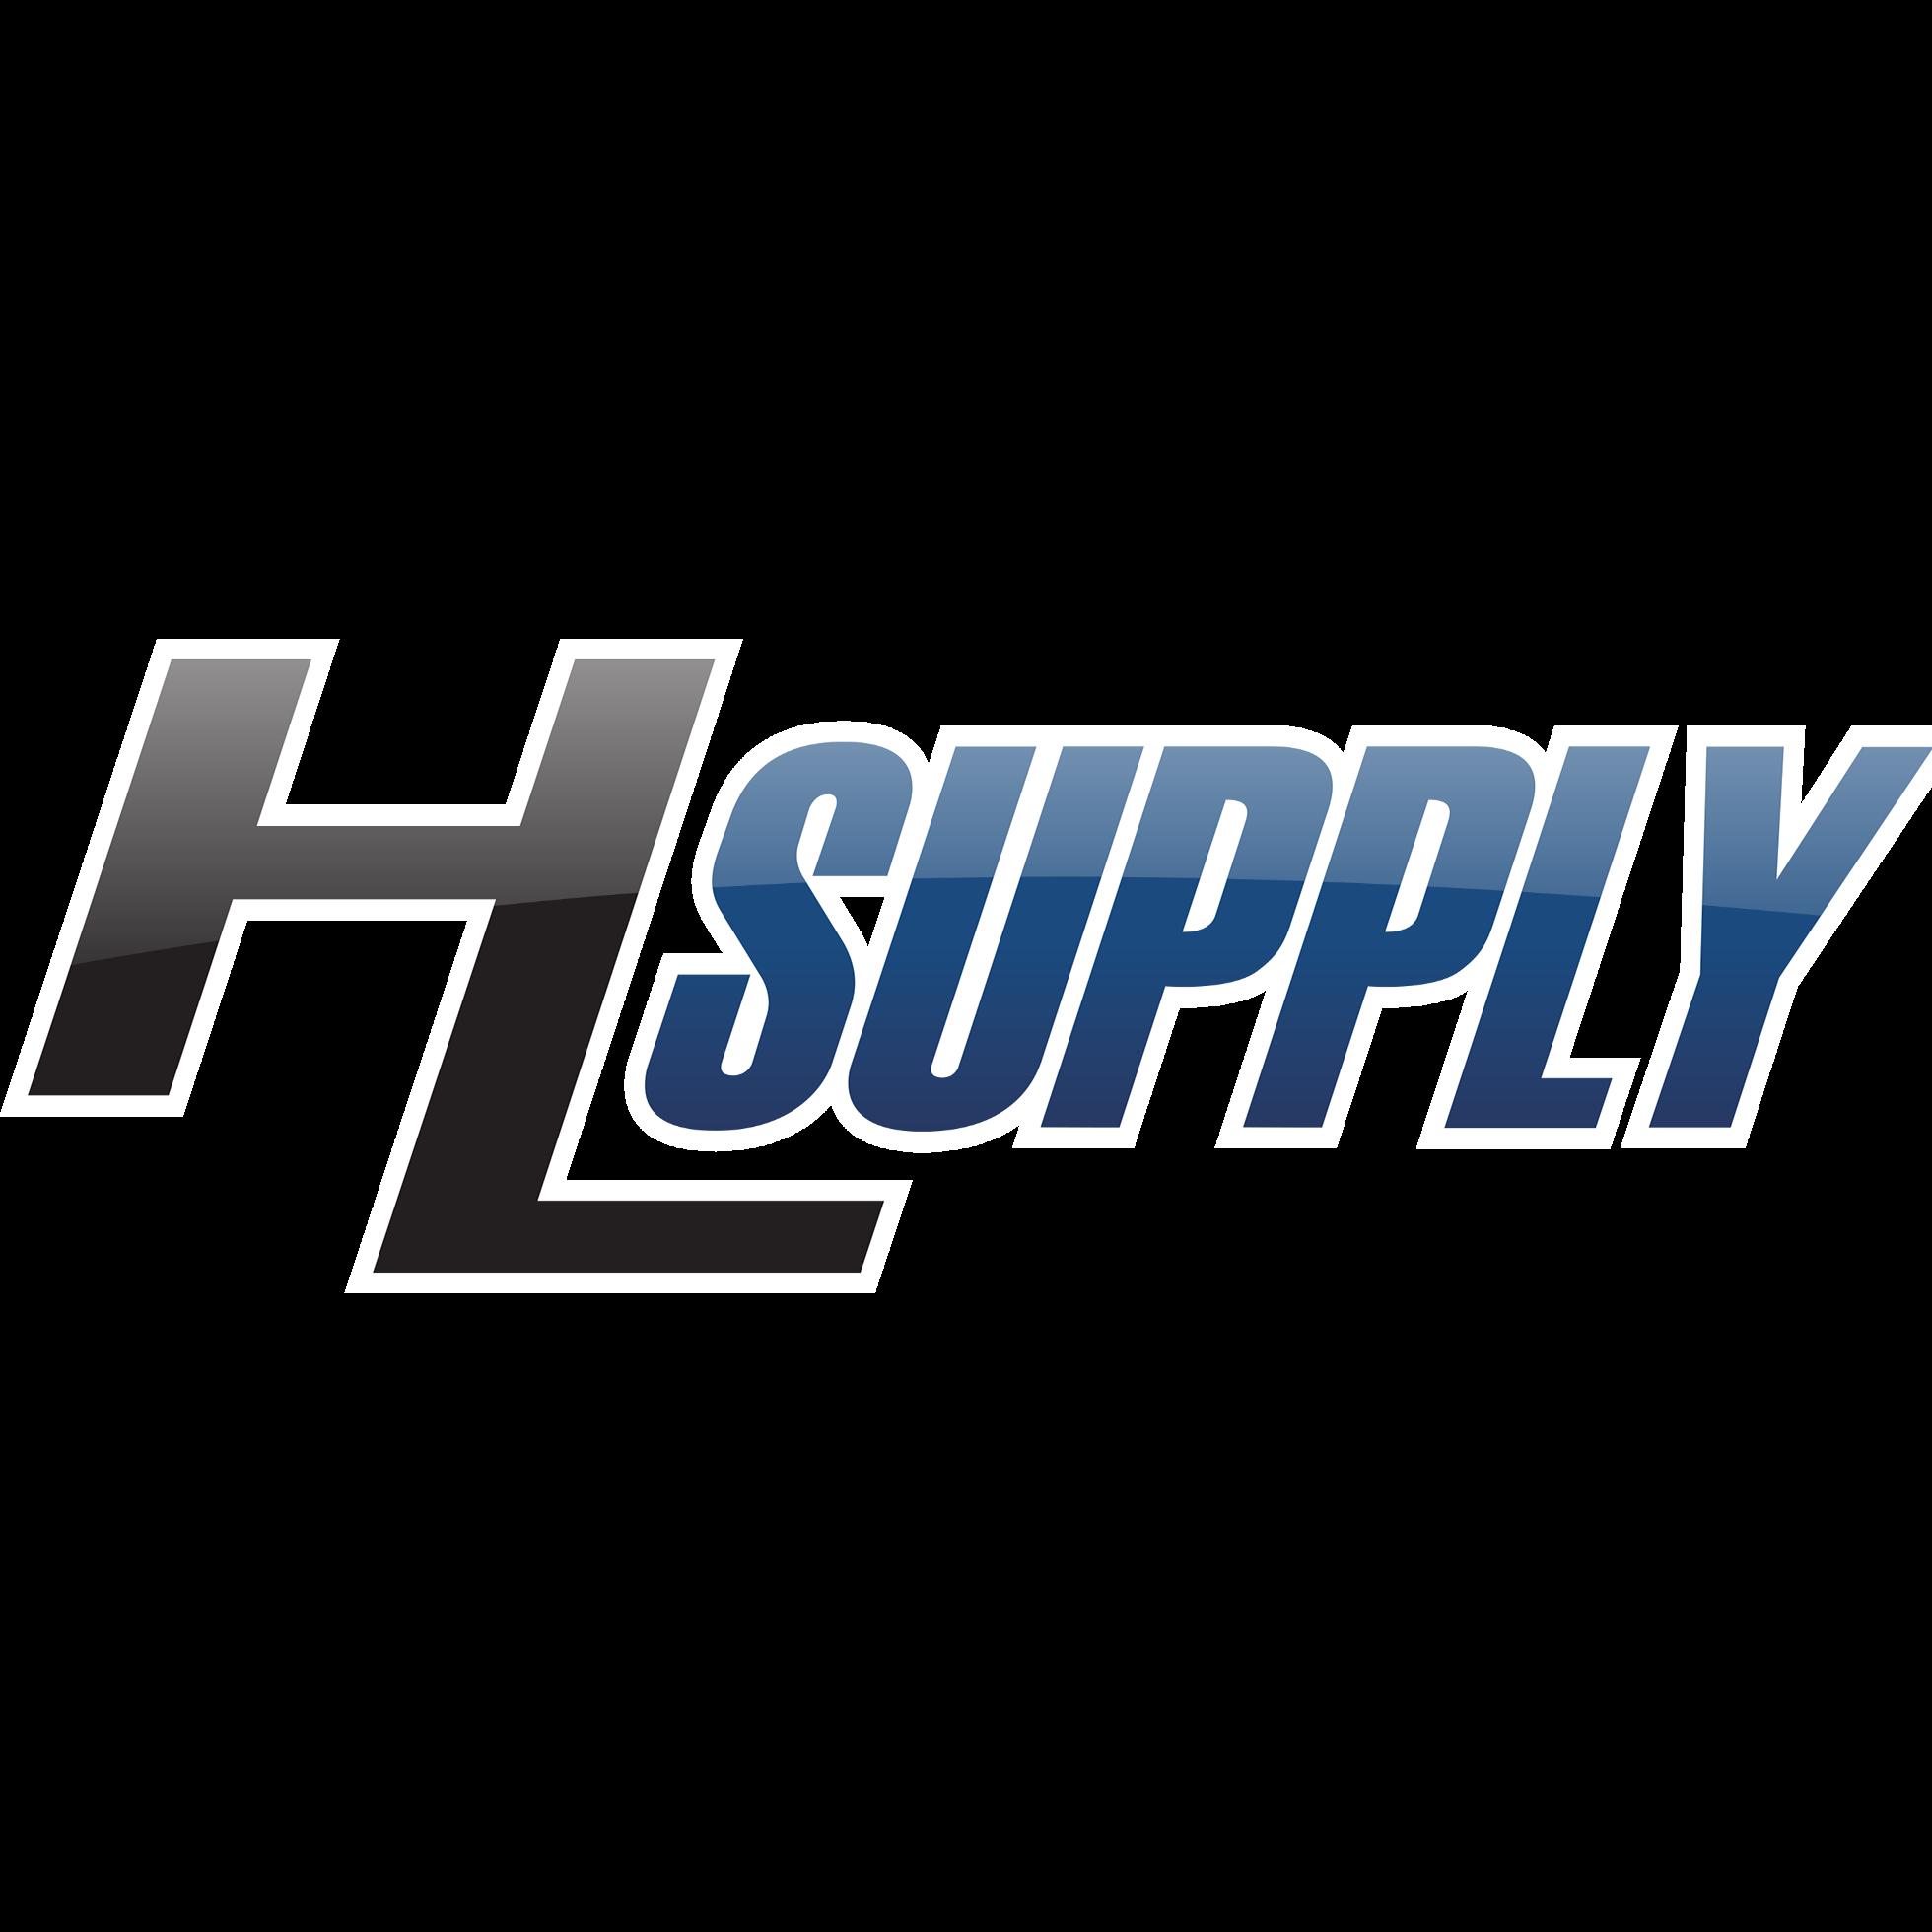 HL Supply - Daytona Beach, FL - Lawn Care & Grounds Maintenance